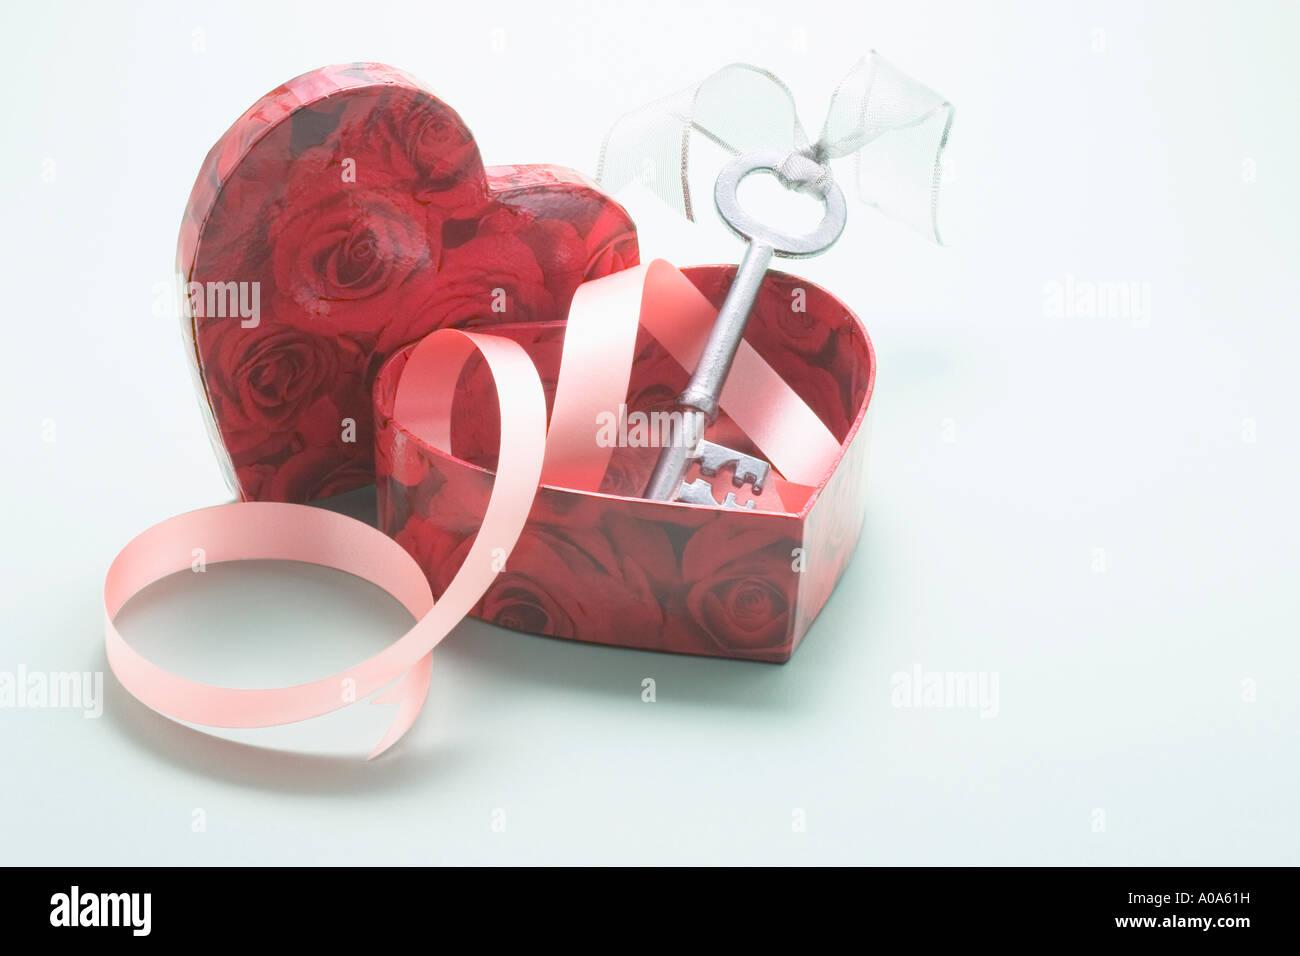 21st Birthday Key in Heart-shaped Box - Stock Image